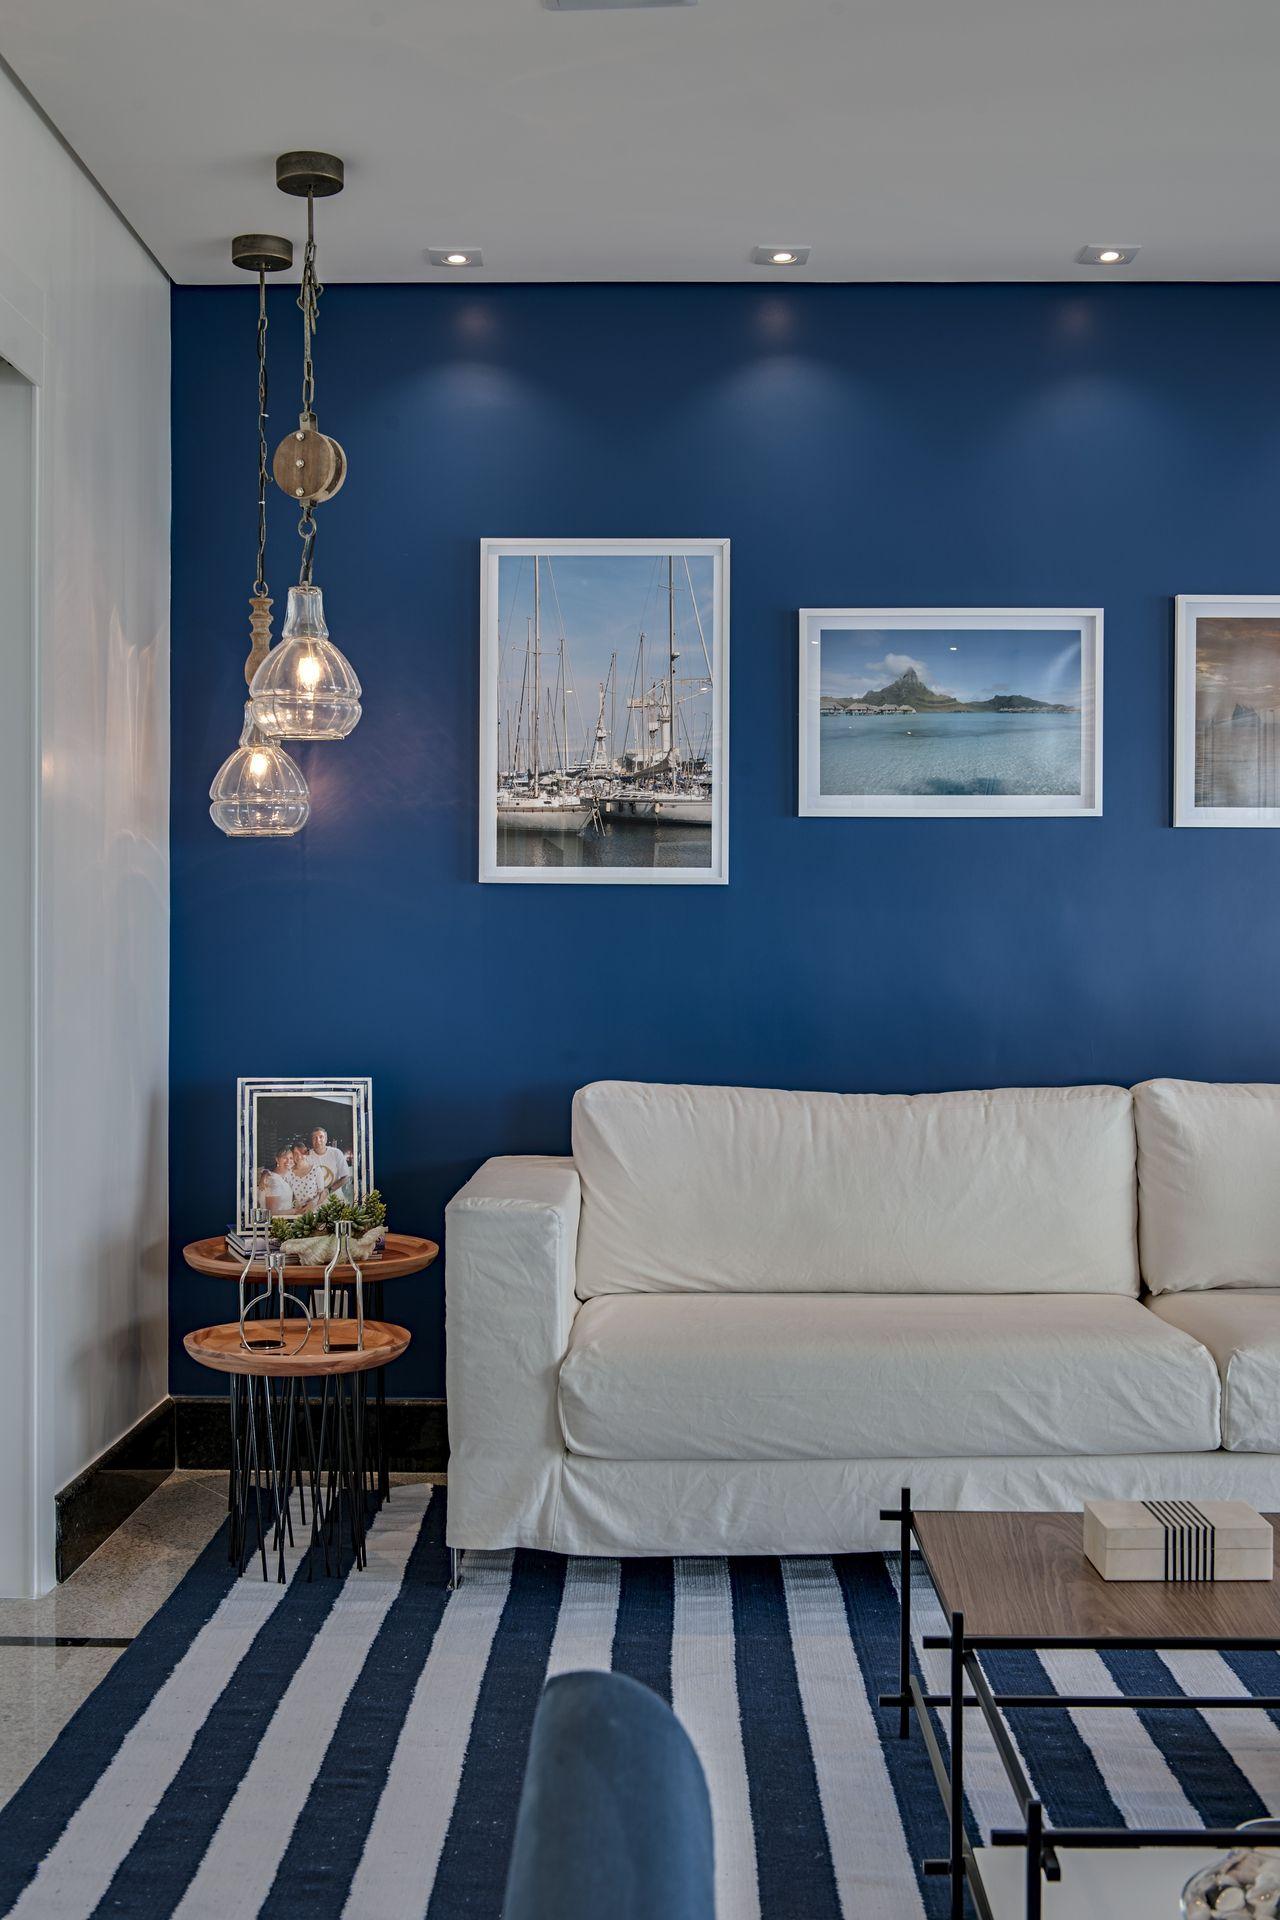 Sala De Estar Com Tapete Listrado Azul E Branco De Marcia Debski  -> Decoracao De Sala Azul